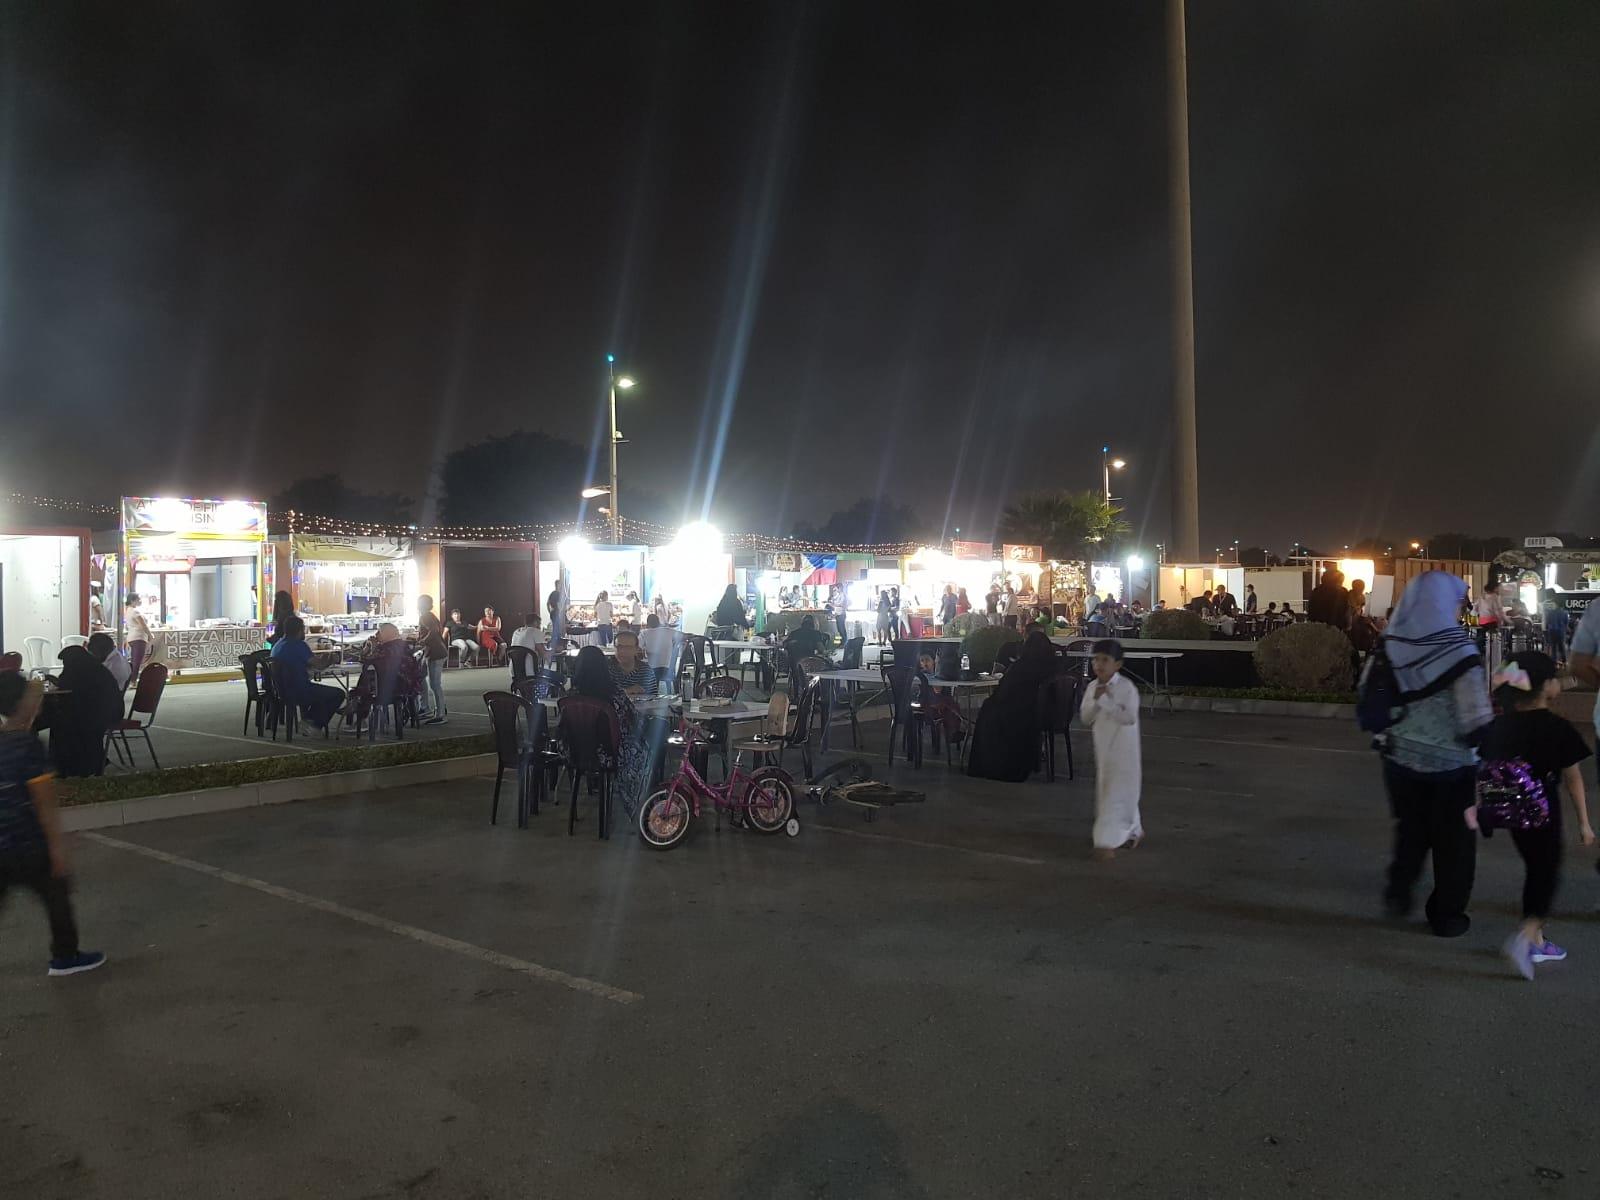 asian-night-market-aspire-parks-asian-night-market-offers-delightful-fare-community